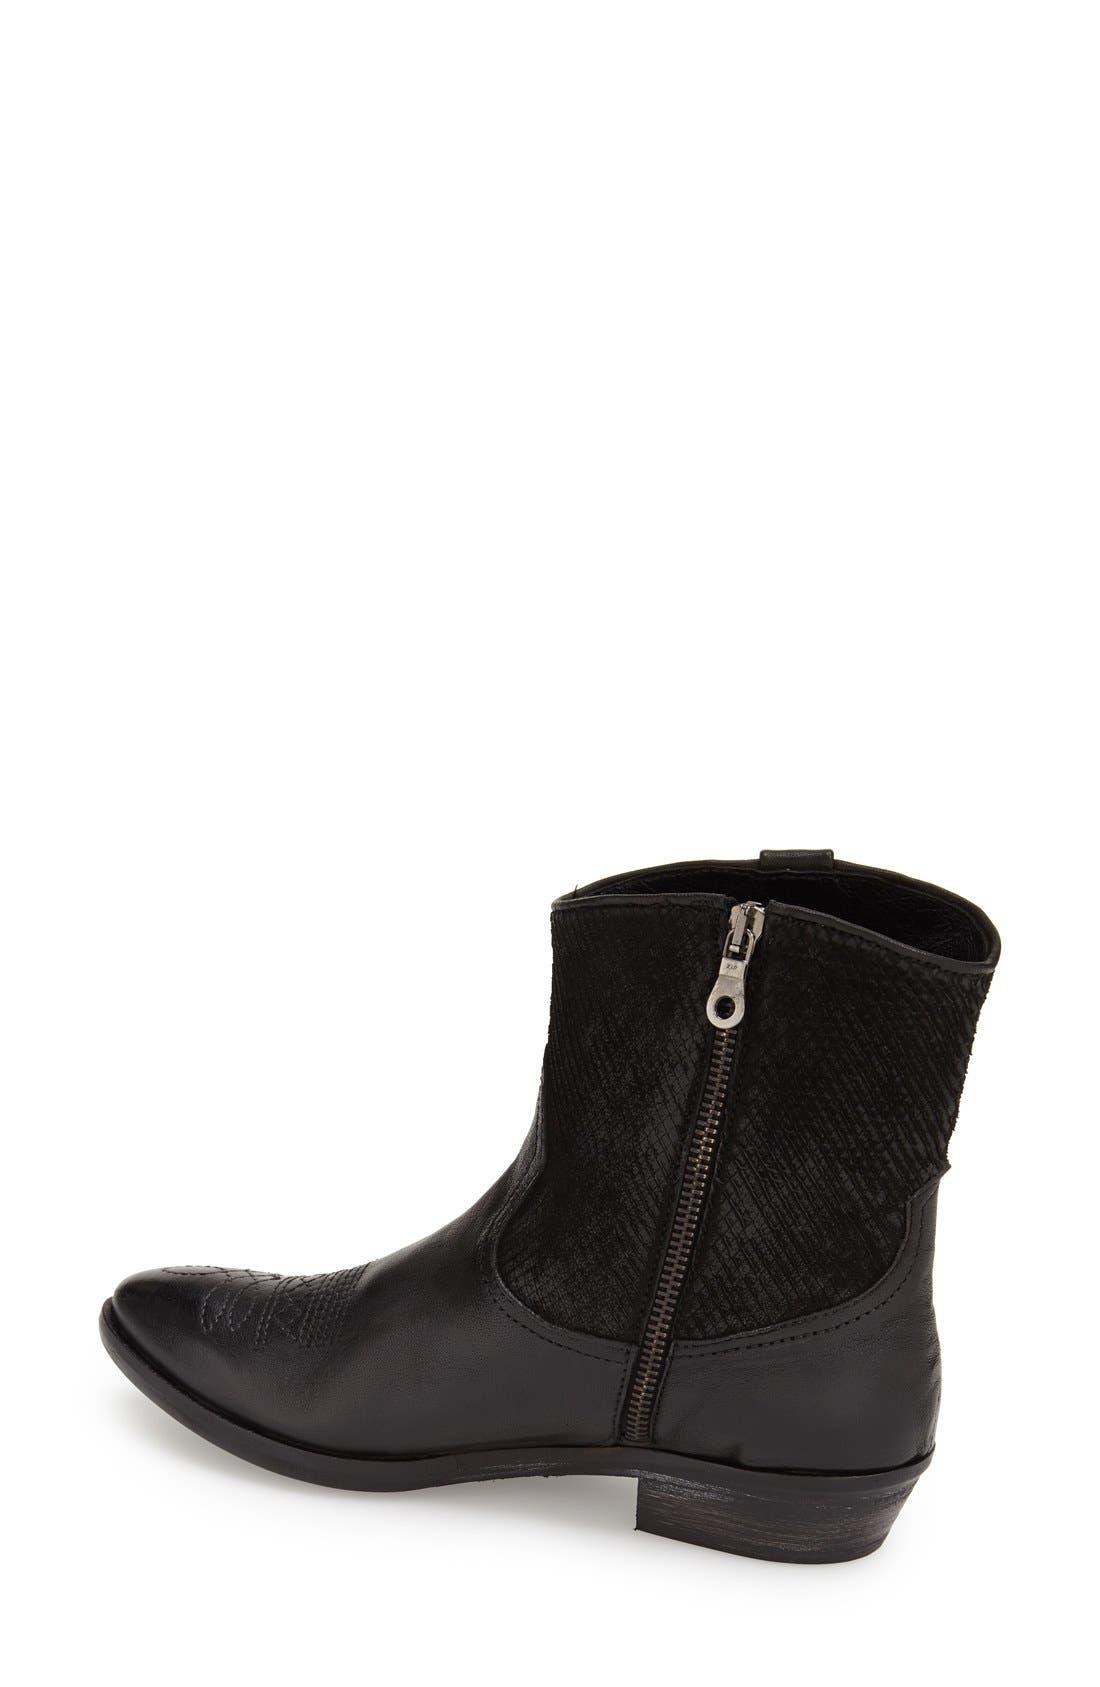 Alternate Image 2  - KBR Flat Boot (Women)